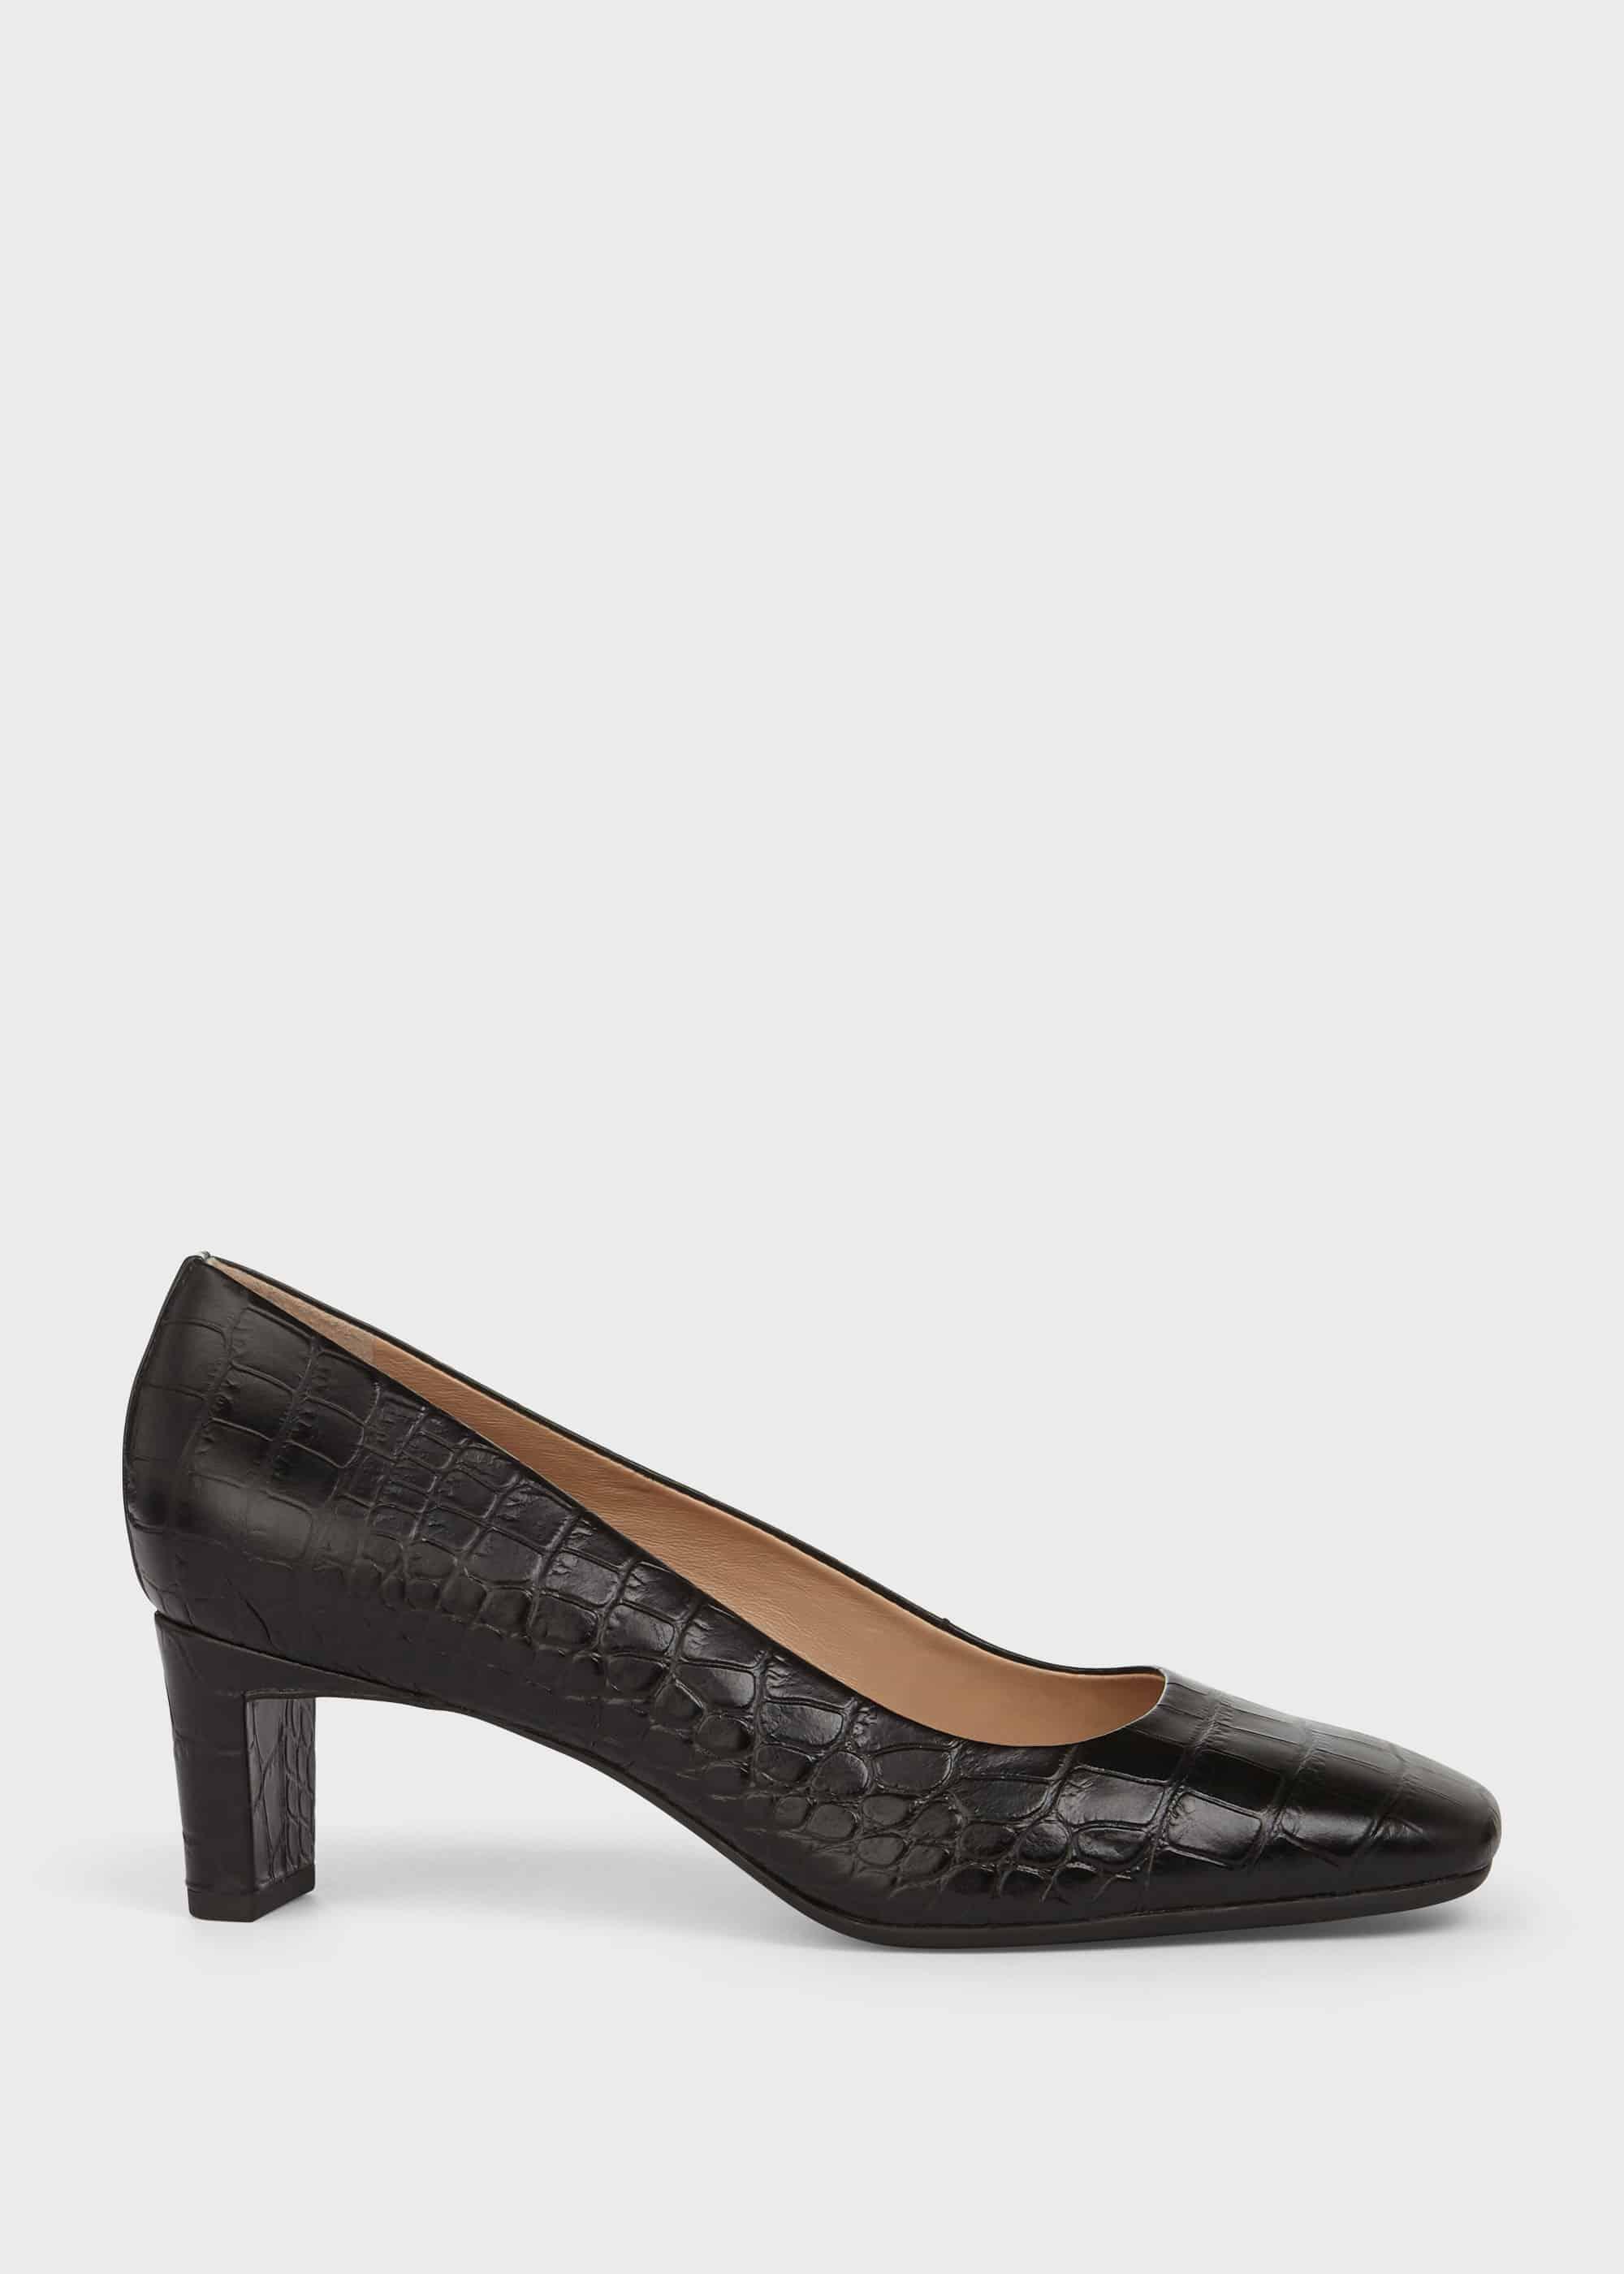 Hobbs Women Myra Leather Court Shoes